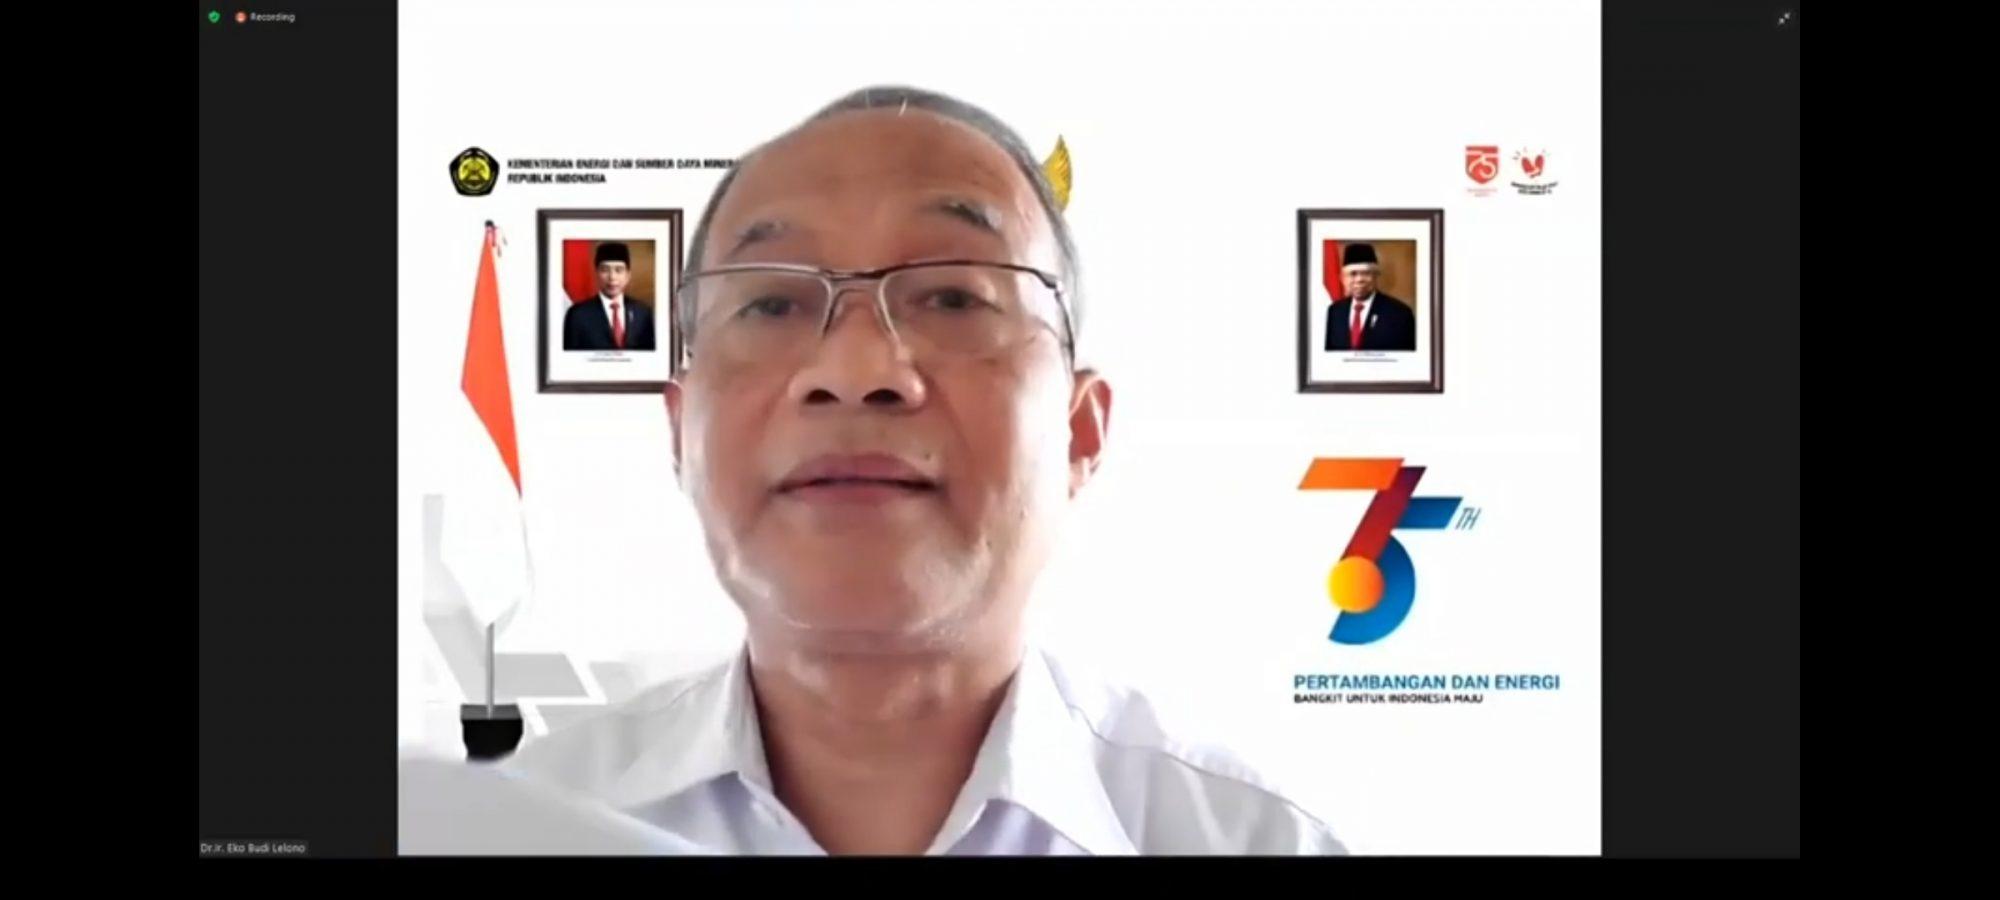 Eko Budi Lelono, kepala badan geologi kementerian ESDM